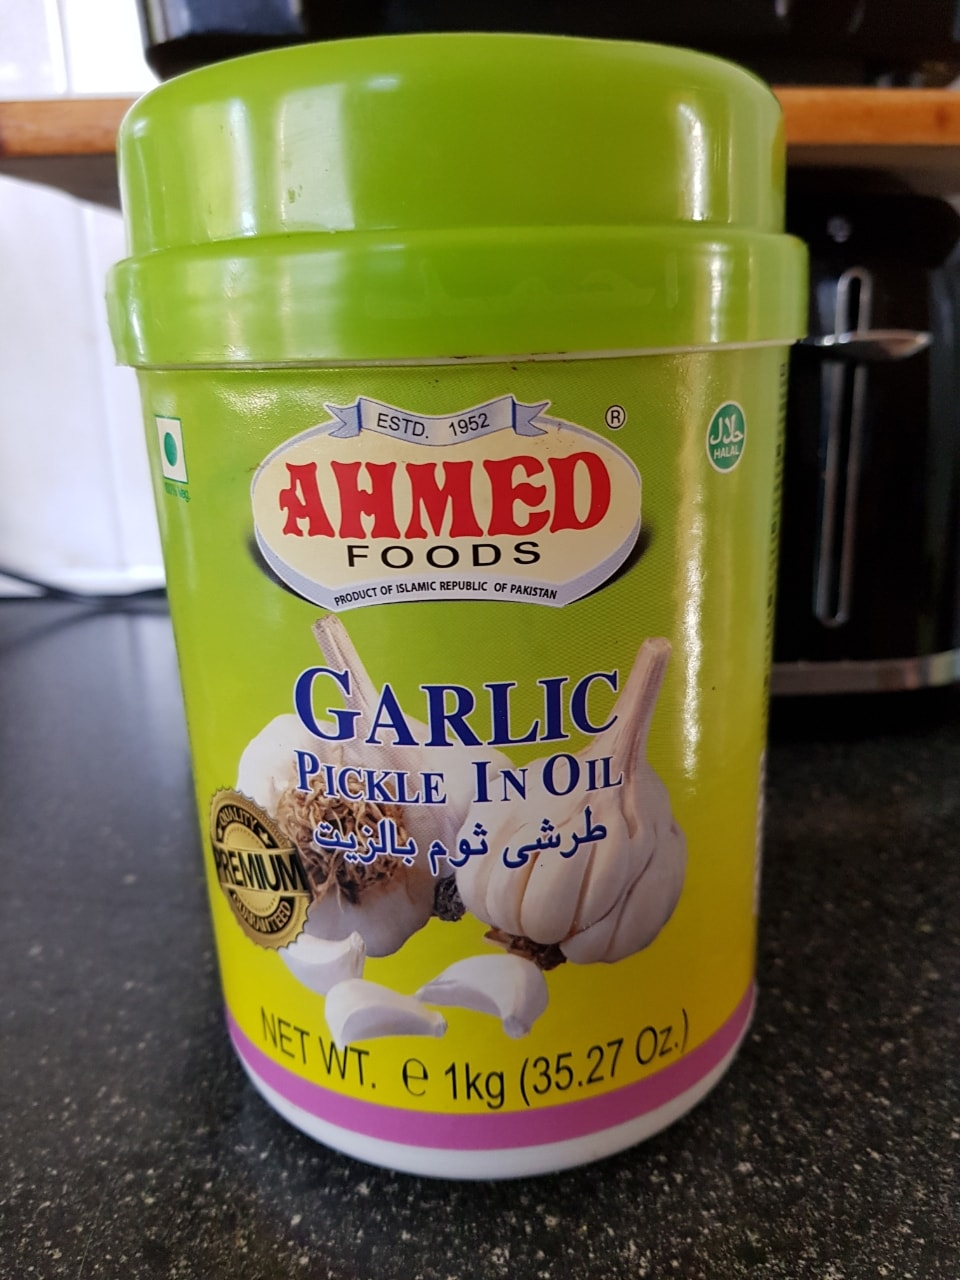 Galic pickle